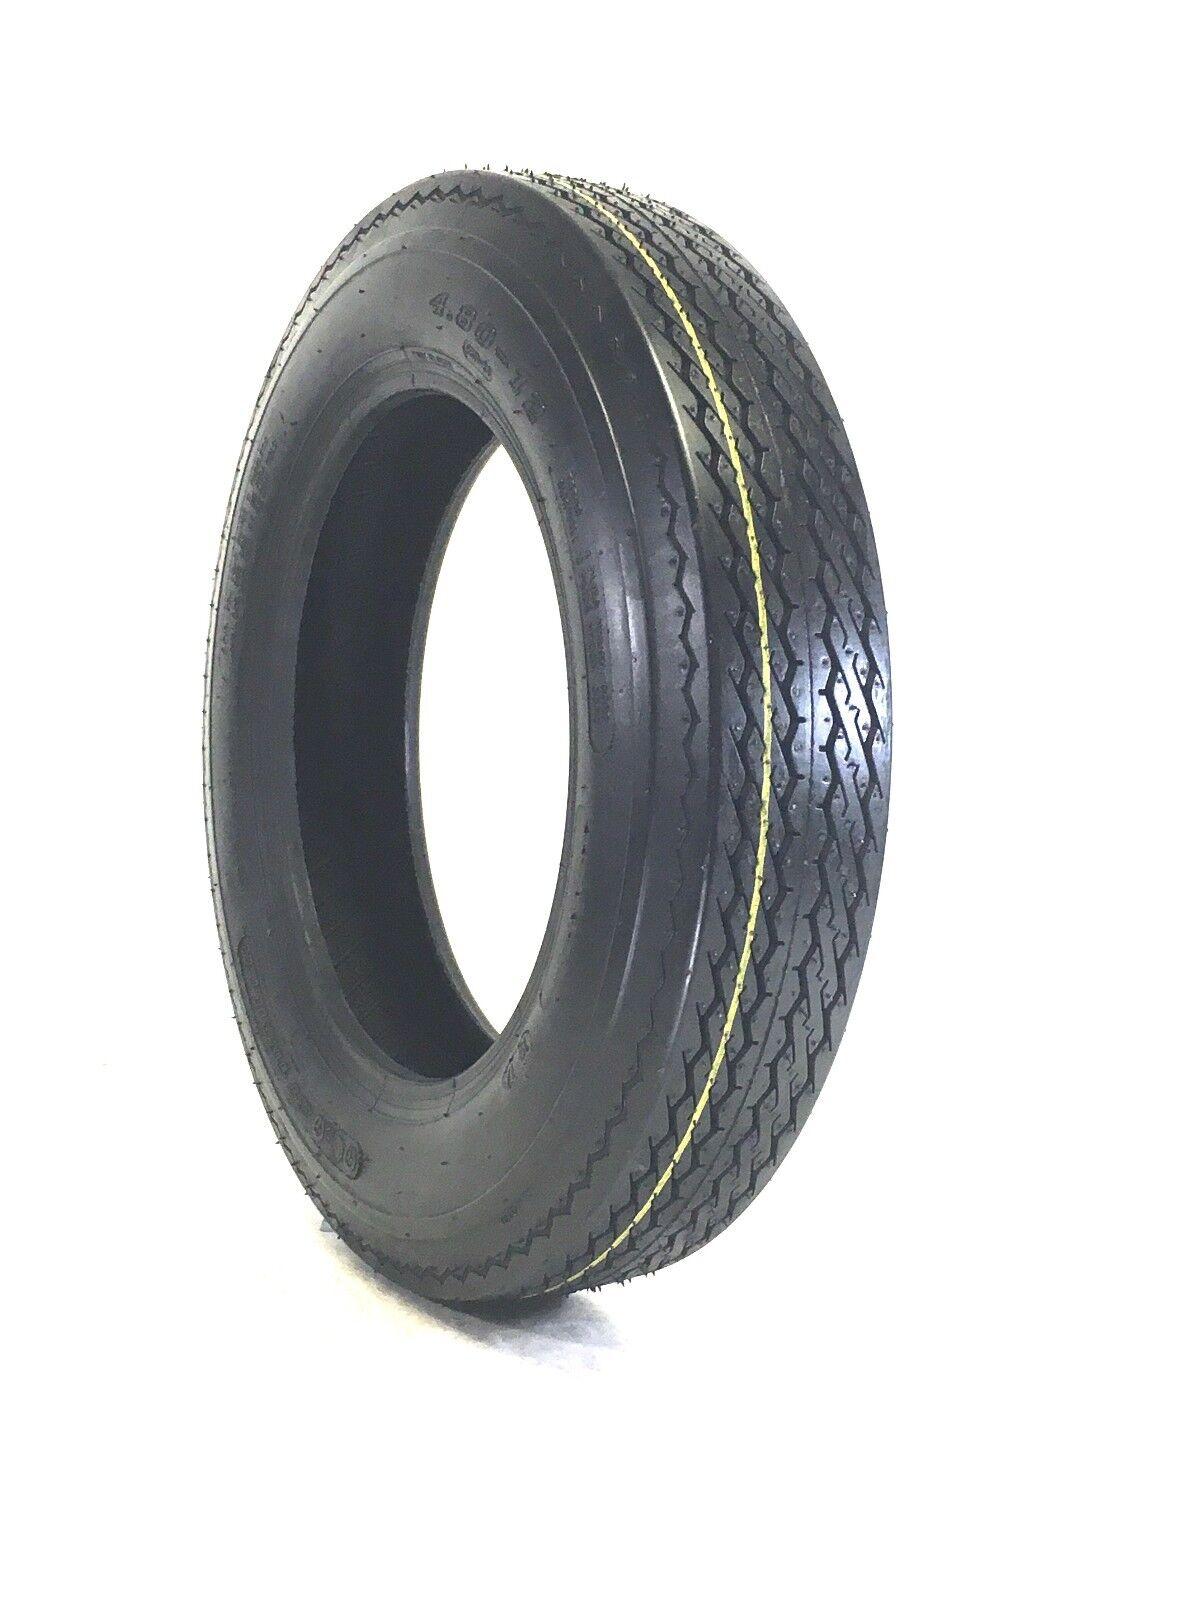 4.80-12 6 Ply Hi-Speed Trailer Tire 4.80X12